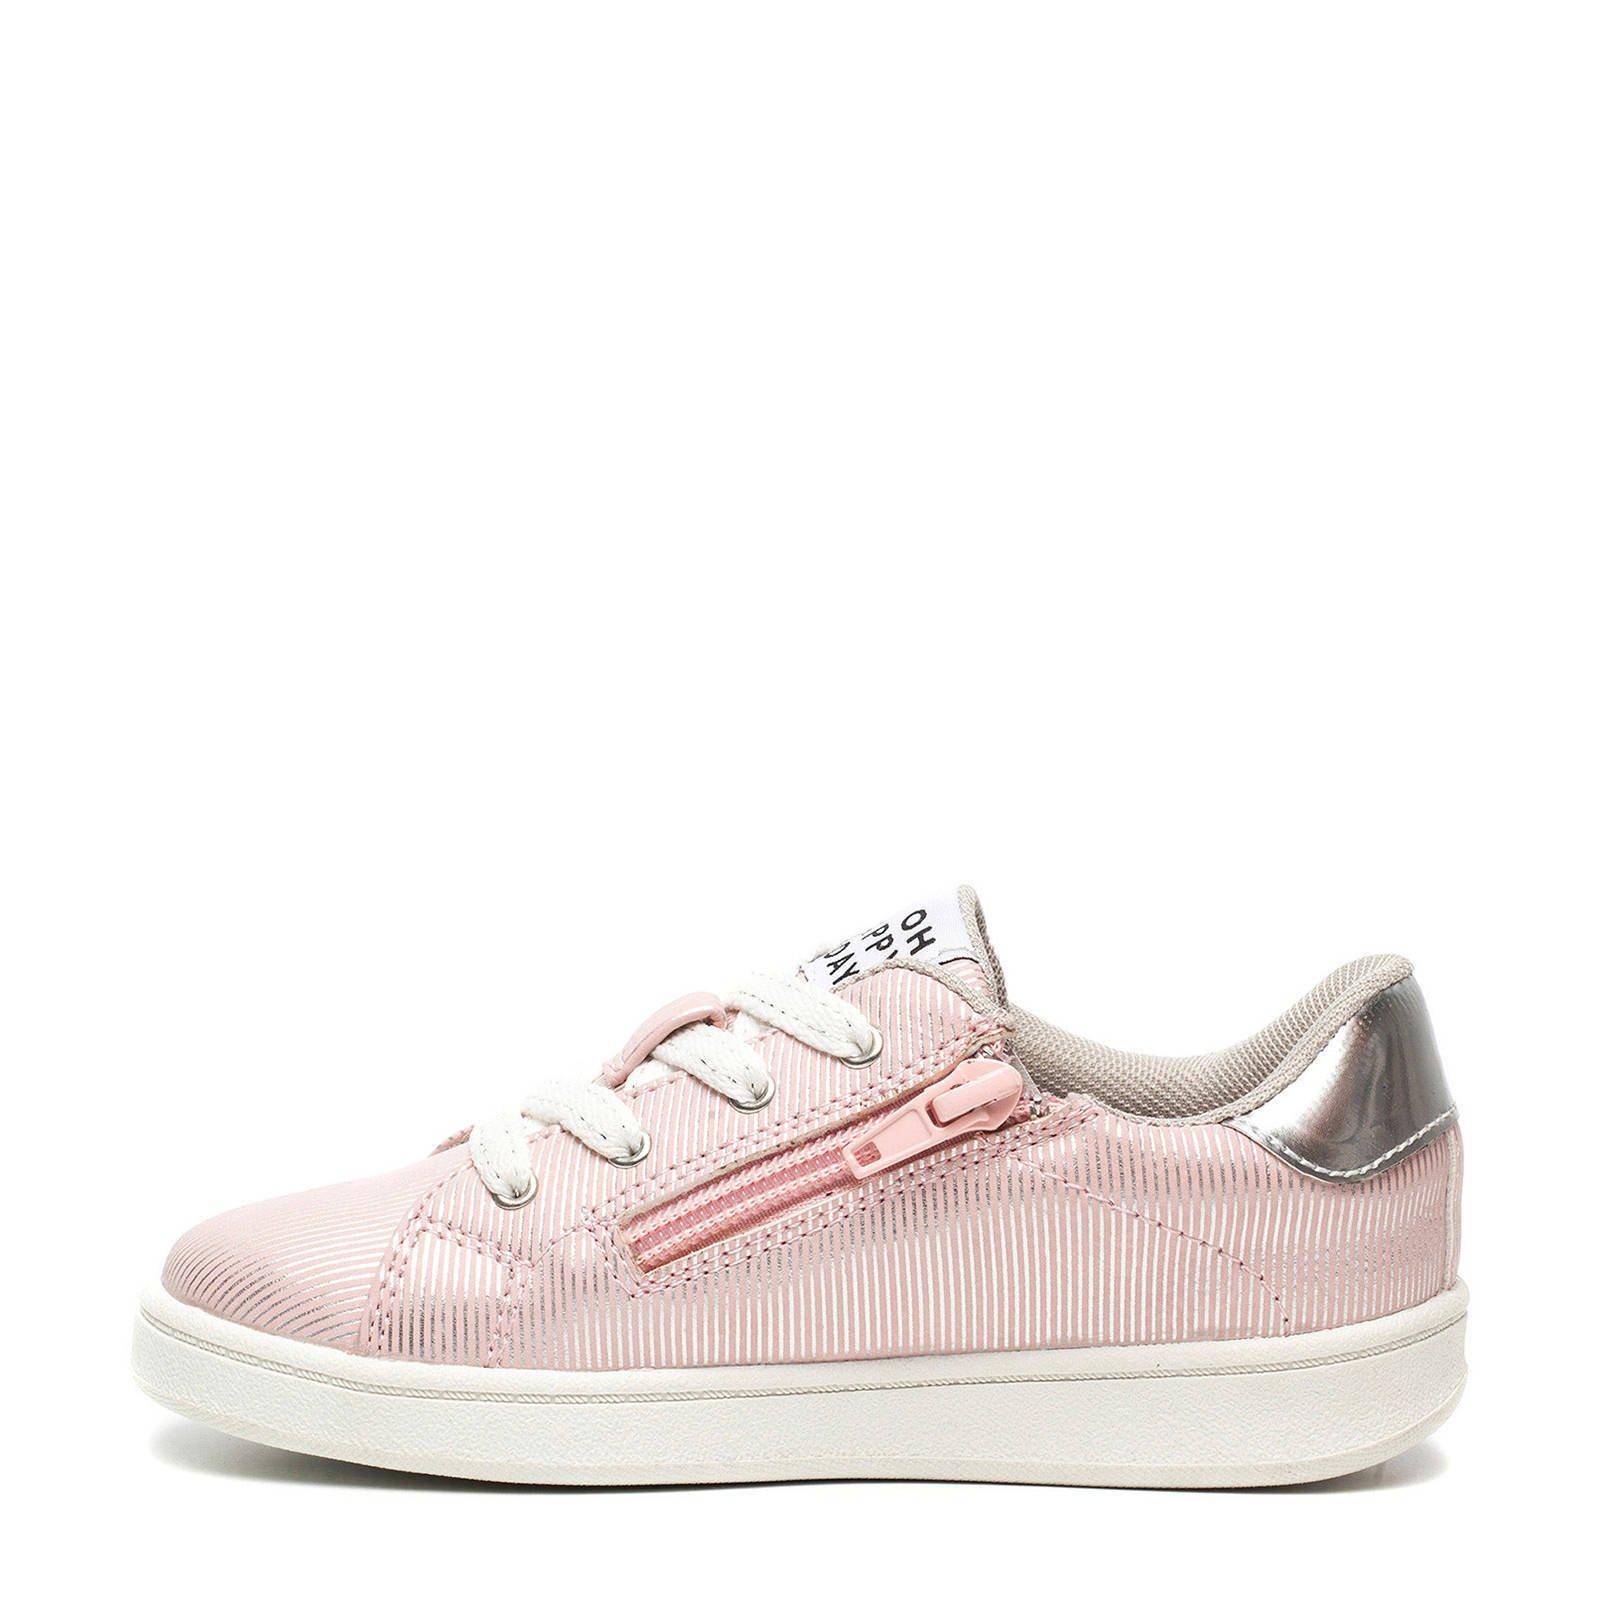 d51e3e41c6e Scapino Blue Box sneakers roze/zilver | wehkamp